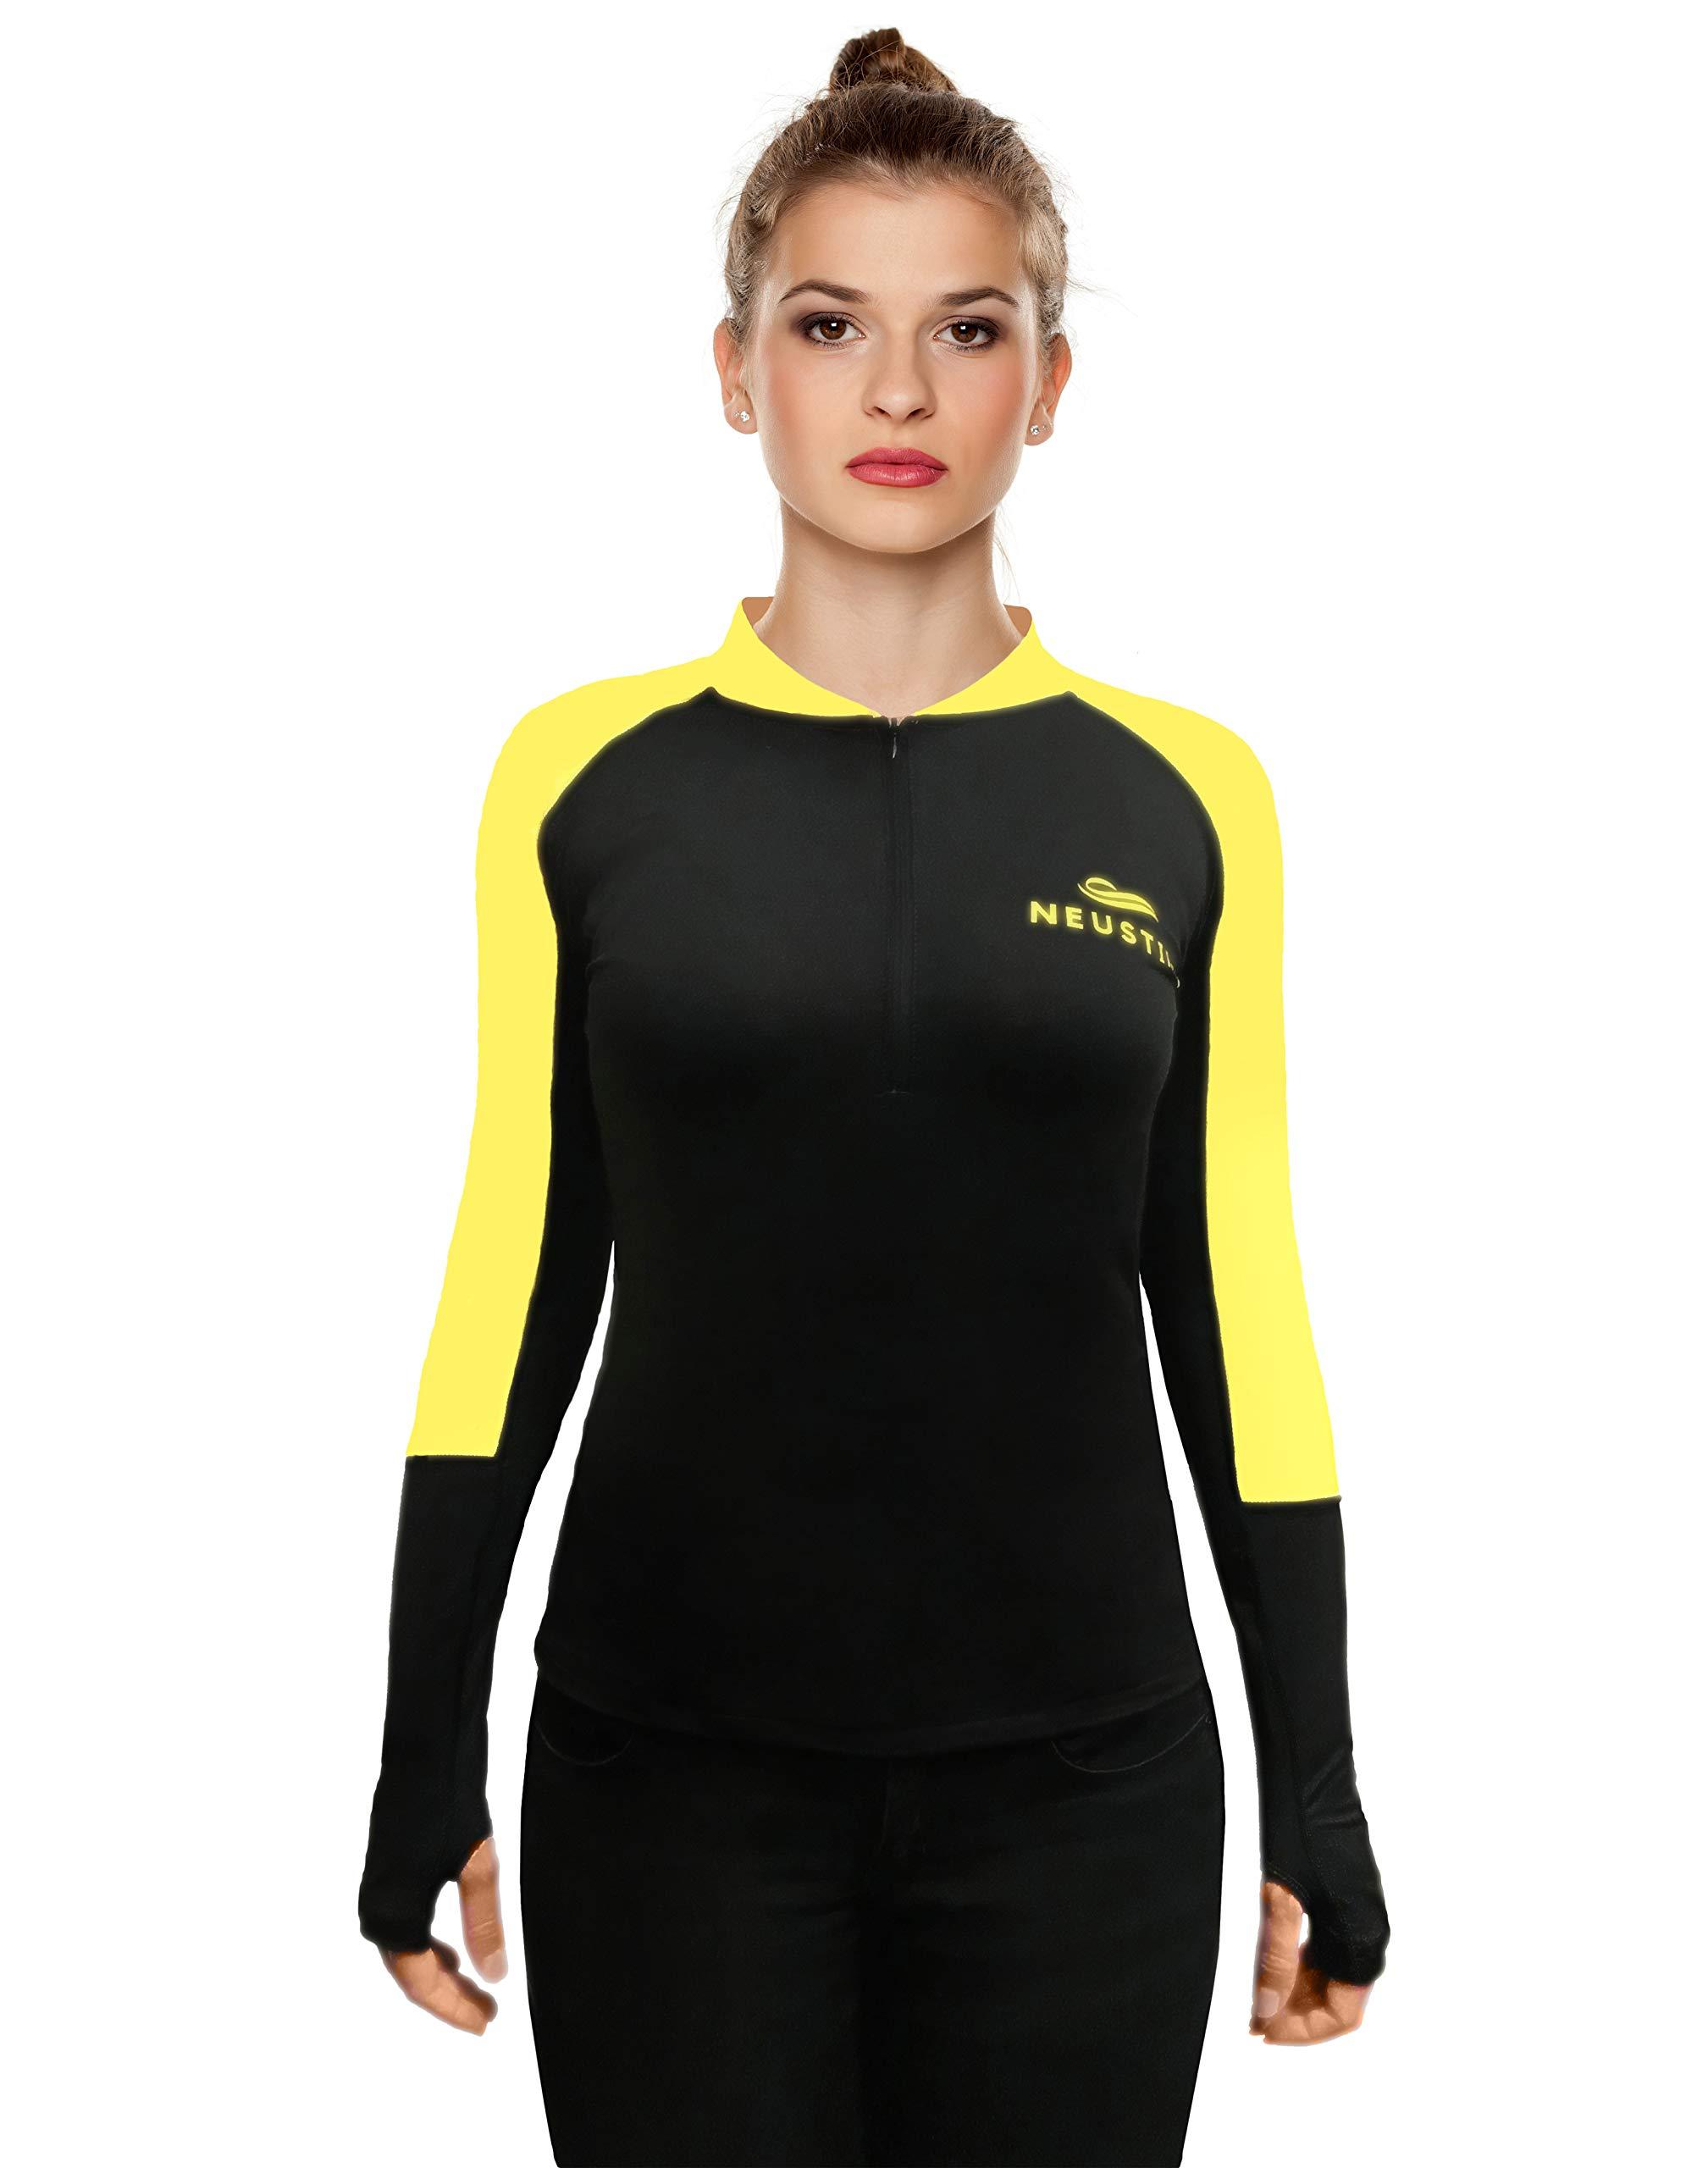 Neustile Women Activewear Short Zipper Top Black Medium - Fitness Yoga Workout by Neustile